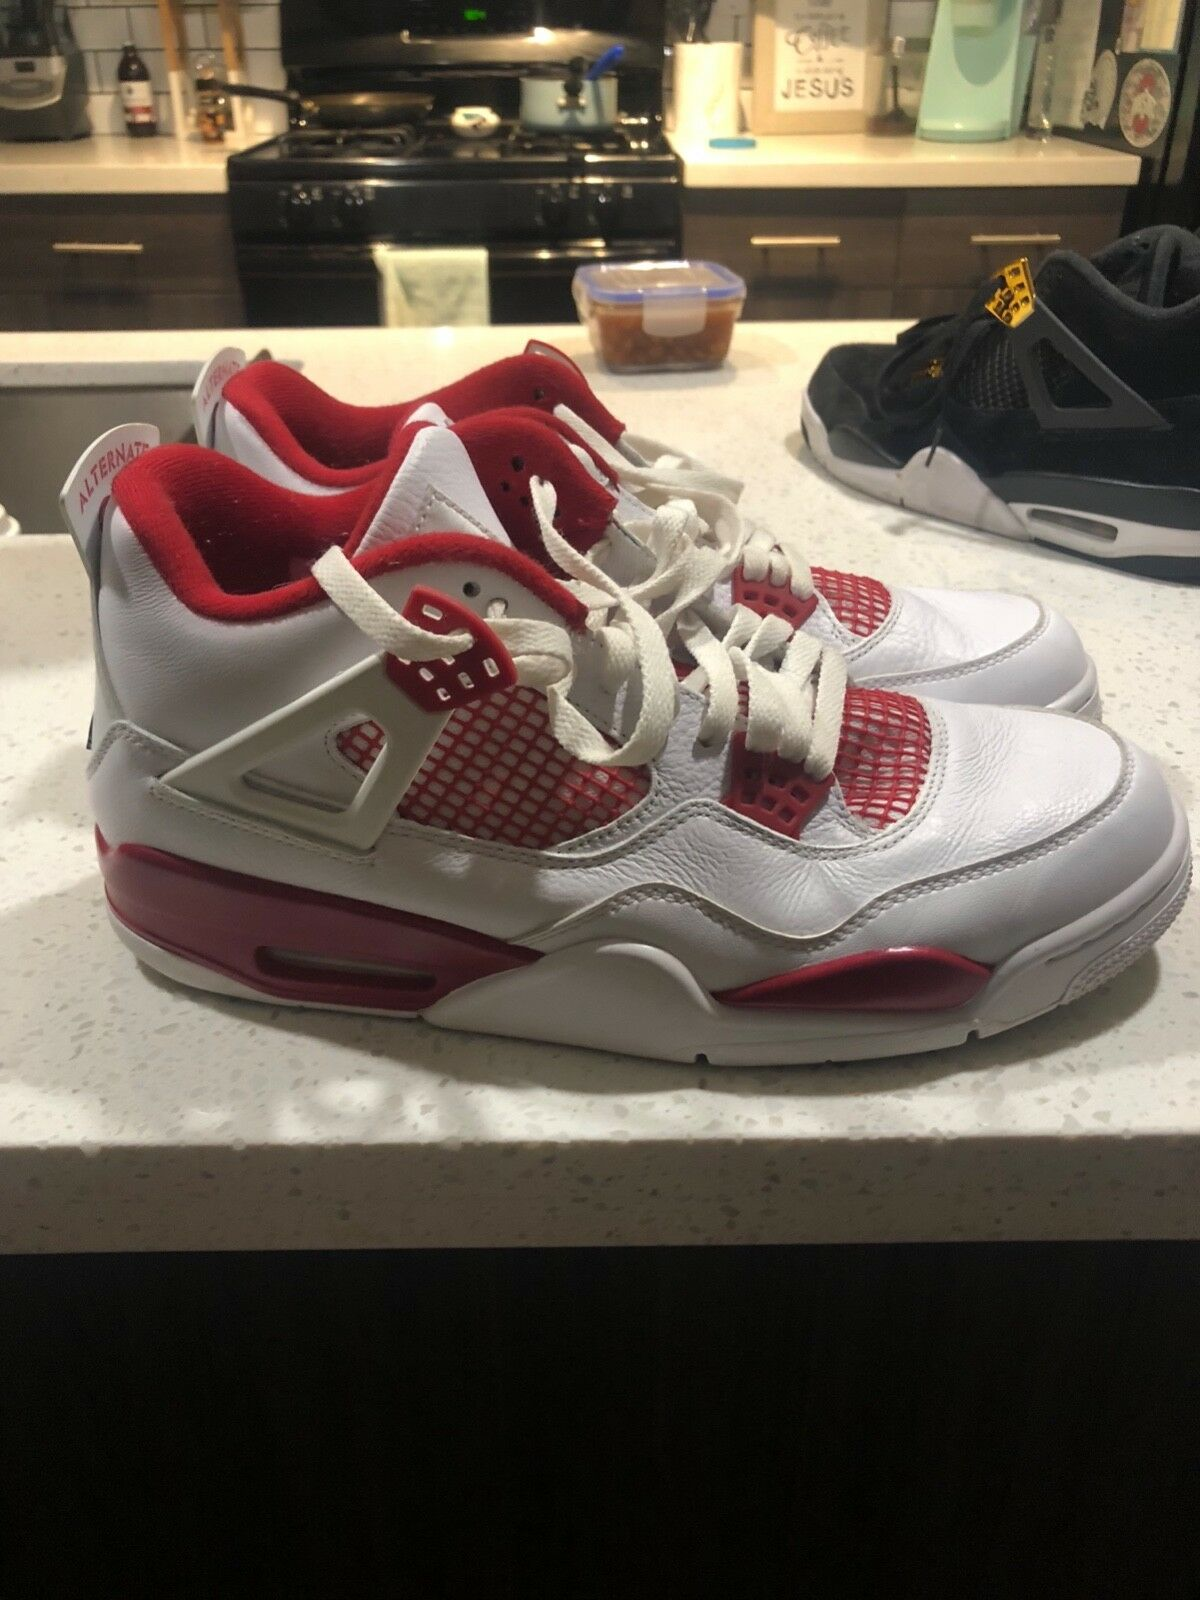 Sneakers Jordan's 4s Nike size 11 good condition slightly warn